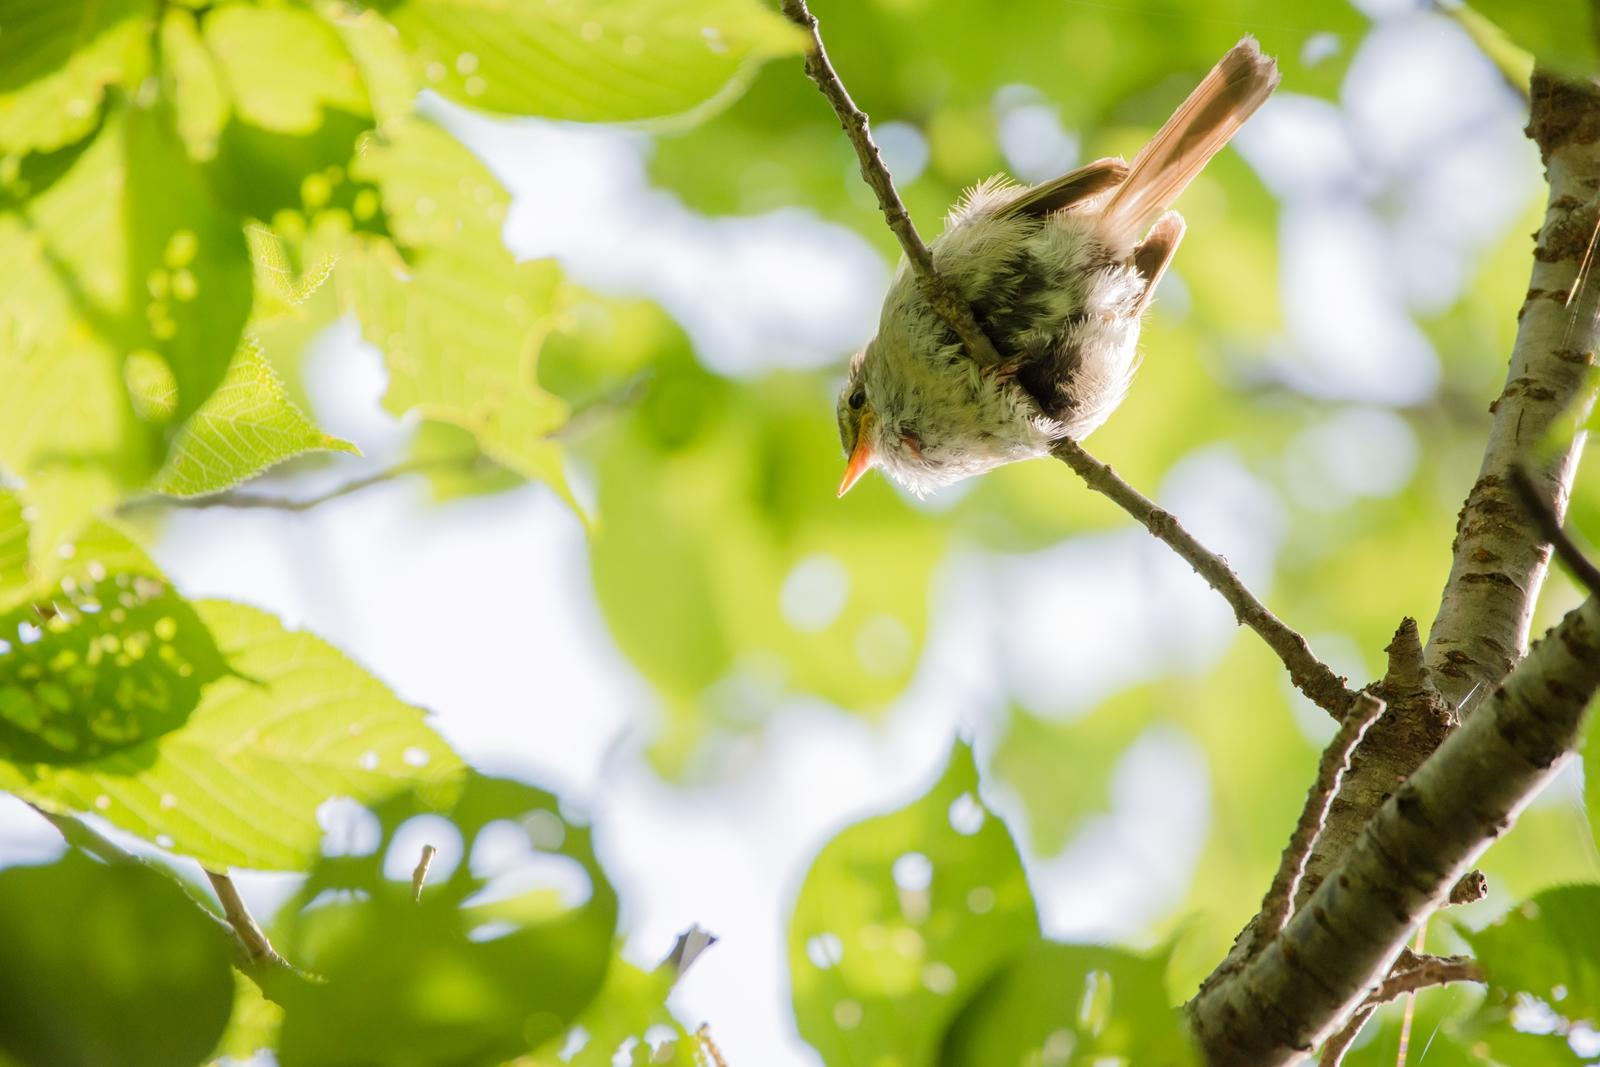 Photo: 木の上の舞台で Singing in the tree stage.  今日も木の上の舞台で 精いっぱいに歌を届ける ちゃんと聴いているよ 想いを込めた君の歌  Japanese Bush Warbler. (ウグイス)  #birdphotography #birds #cooljapan #kawaii #nikon #sigma  Nikon D7200 SIGMA 150-600mm F5-6.3 DG OS HSM Contemporary  ・小鳥の詩朗読 /poetry reading https://youtu.be/dBap0t5Qd9w?list=PL2YtHGm0-R3qVsaqvQe9OYdJFCkI98wzF